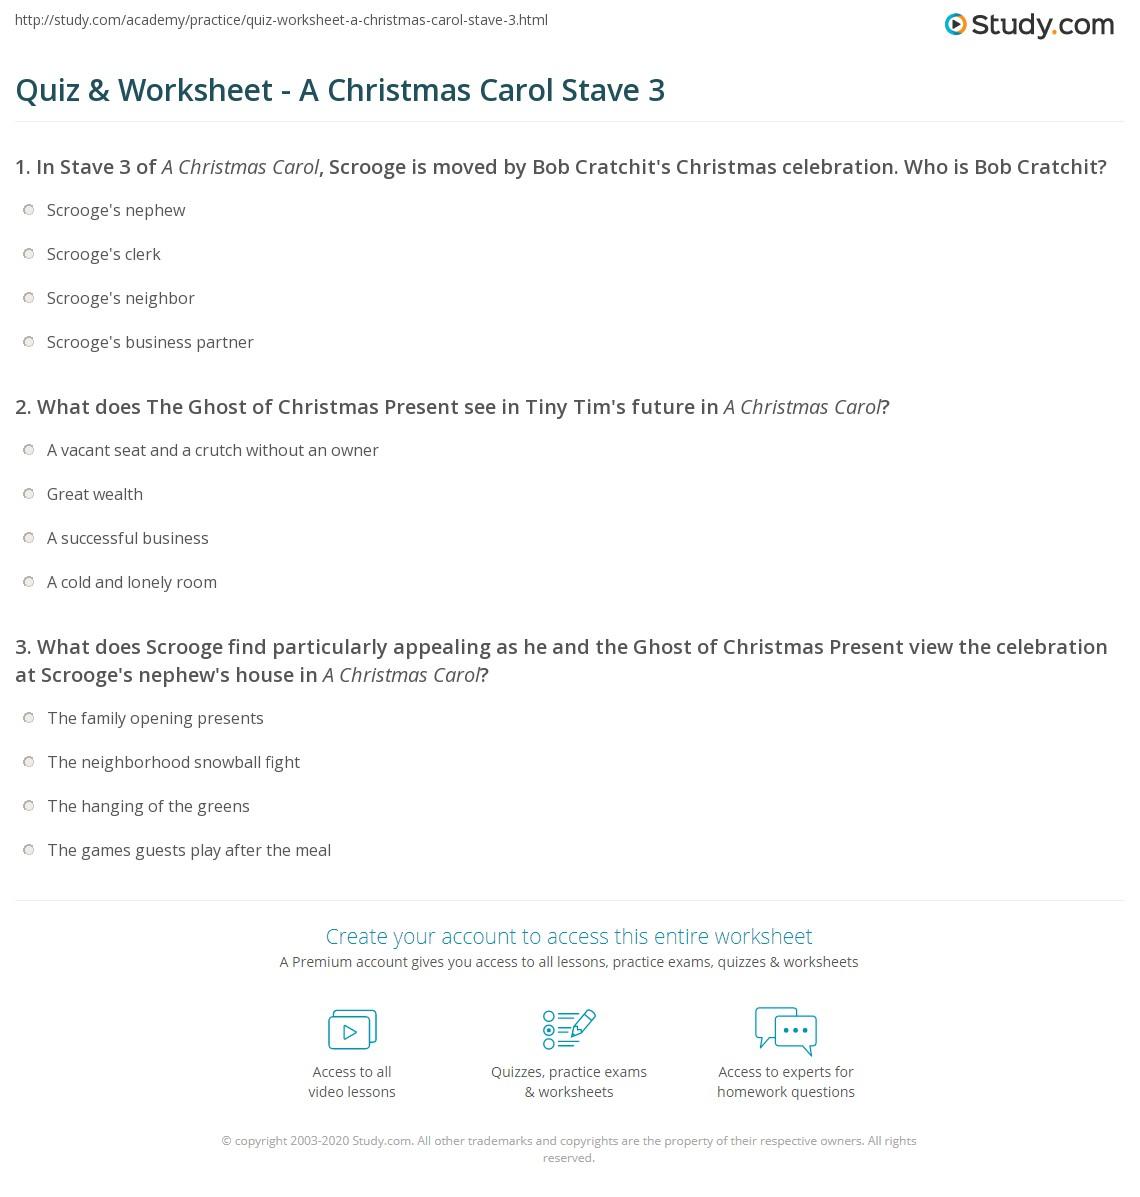 Quiz & Worksheet - A Christmas Carol Stave 3 | Study